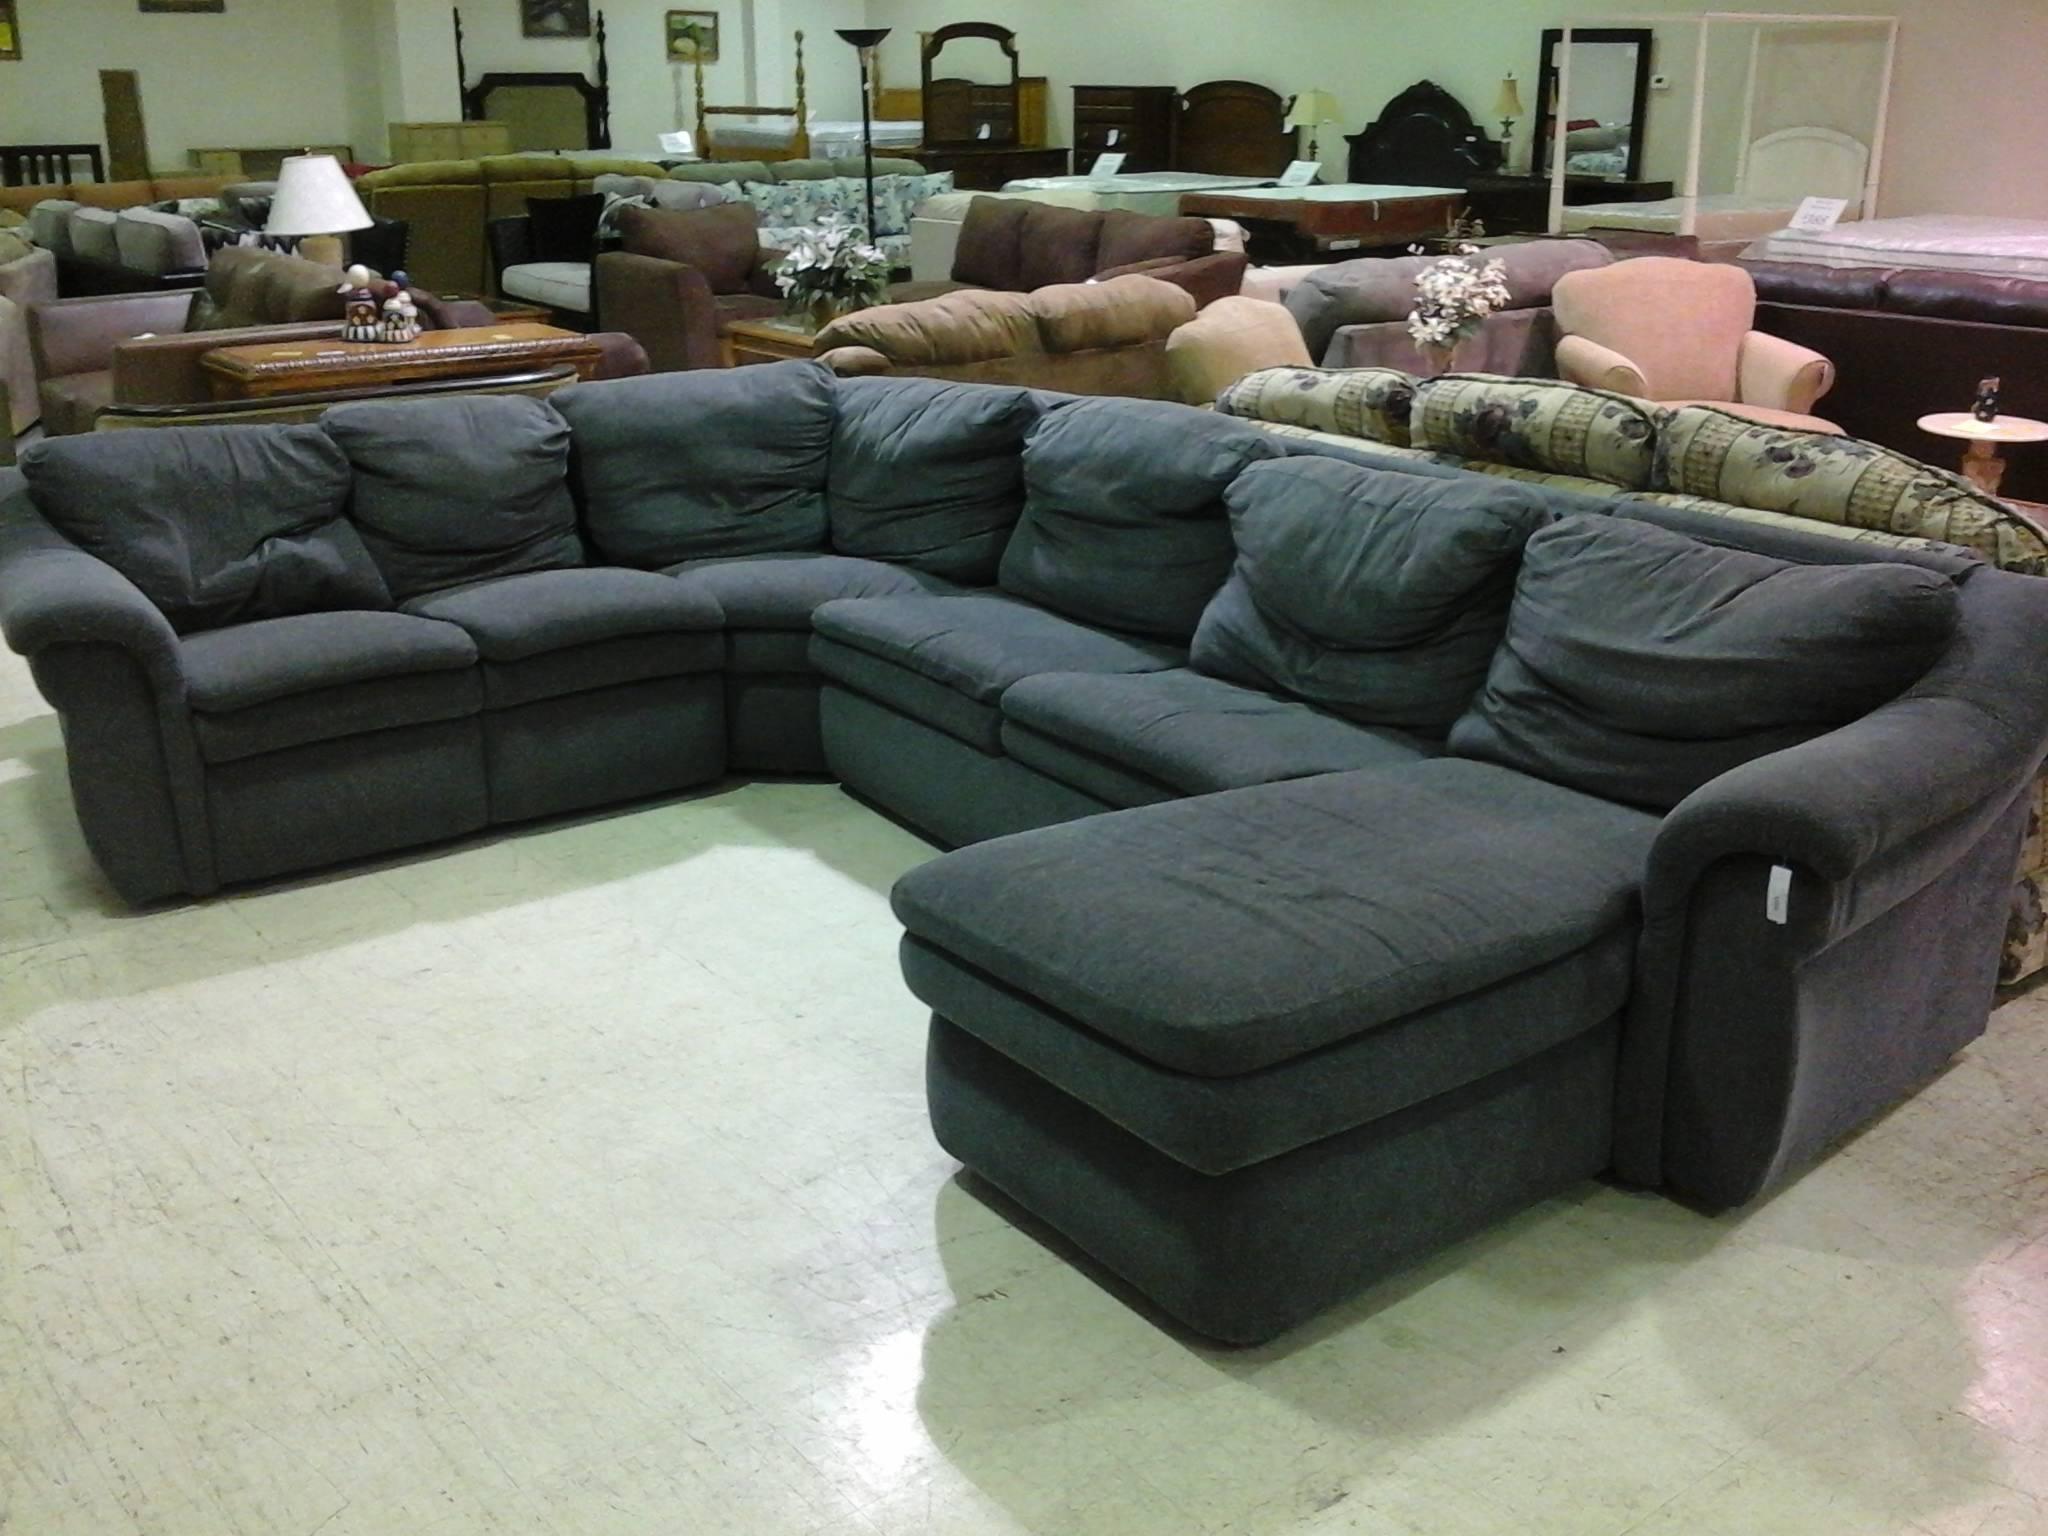 Decorating: Black Leather Sectional Sleeper Sofa For Home with Black Leather Sectional Sleeper Sofas (Image 9 of 30)